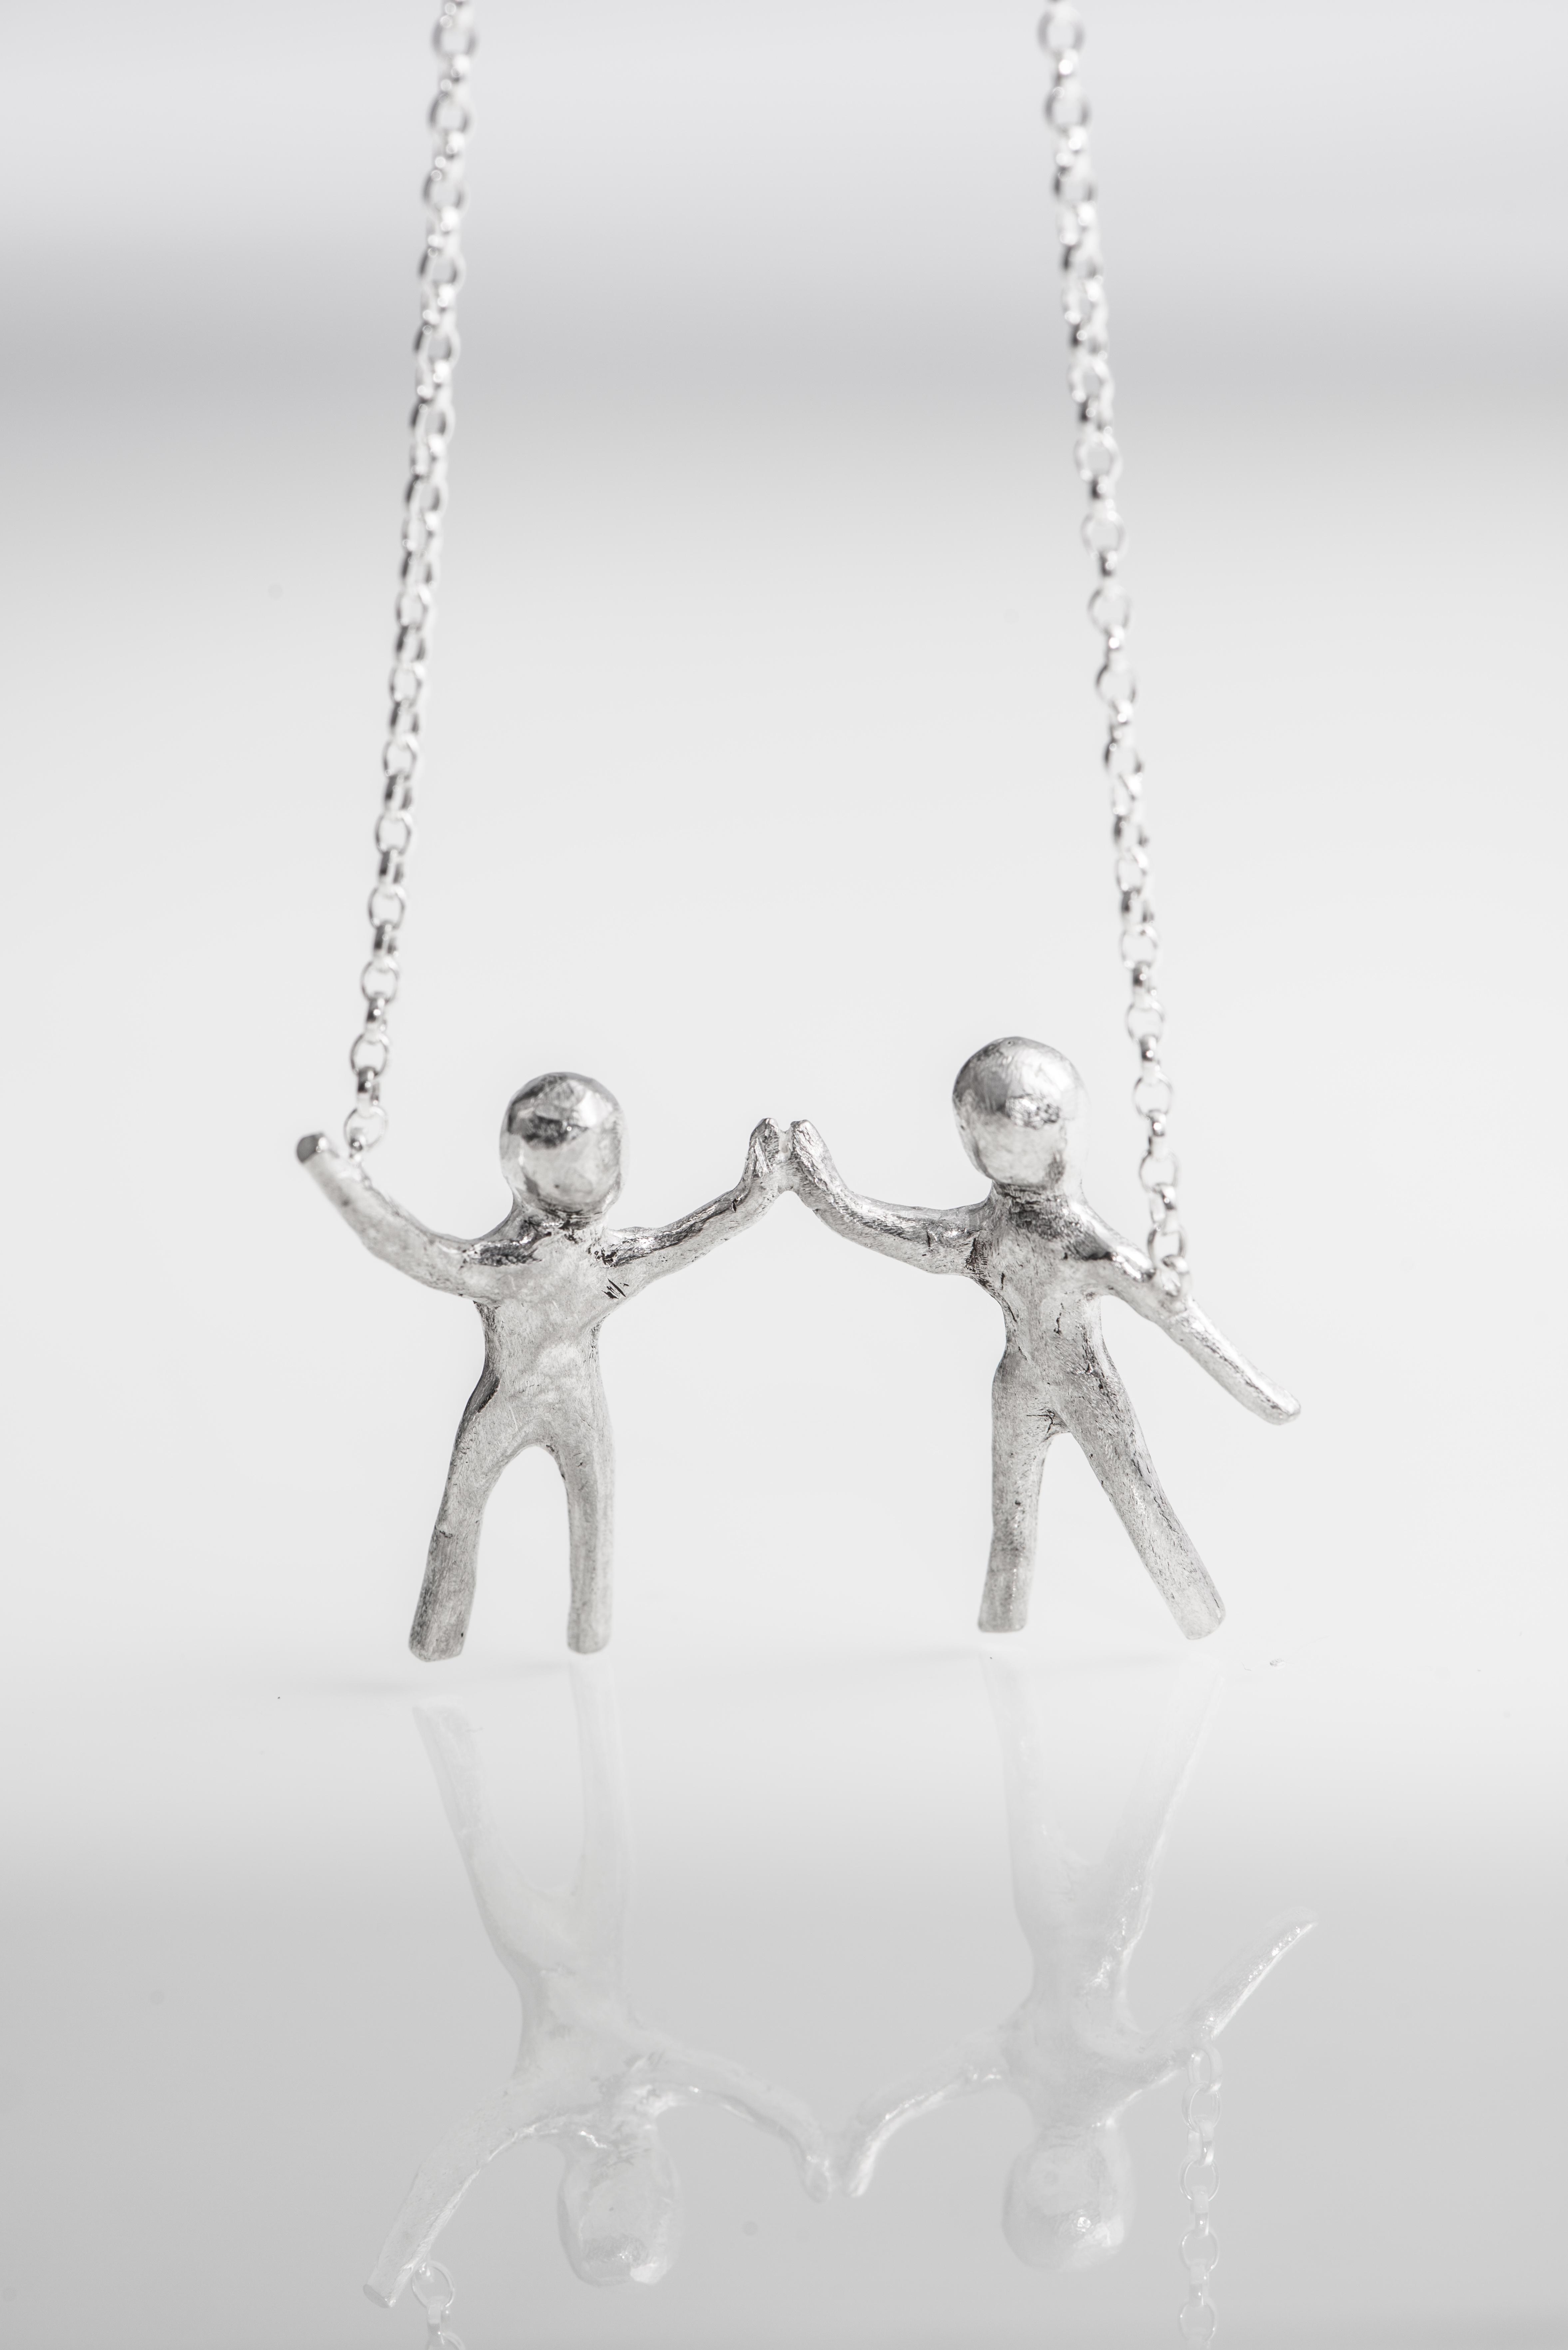 Little People Holding Hands Necklace Abigail J Marsh